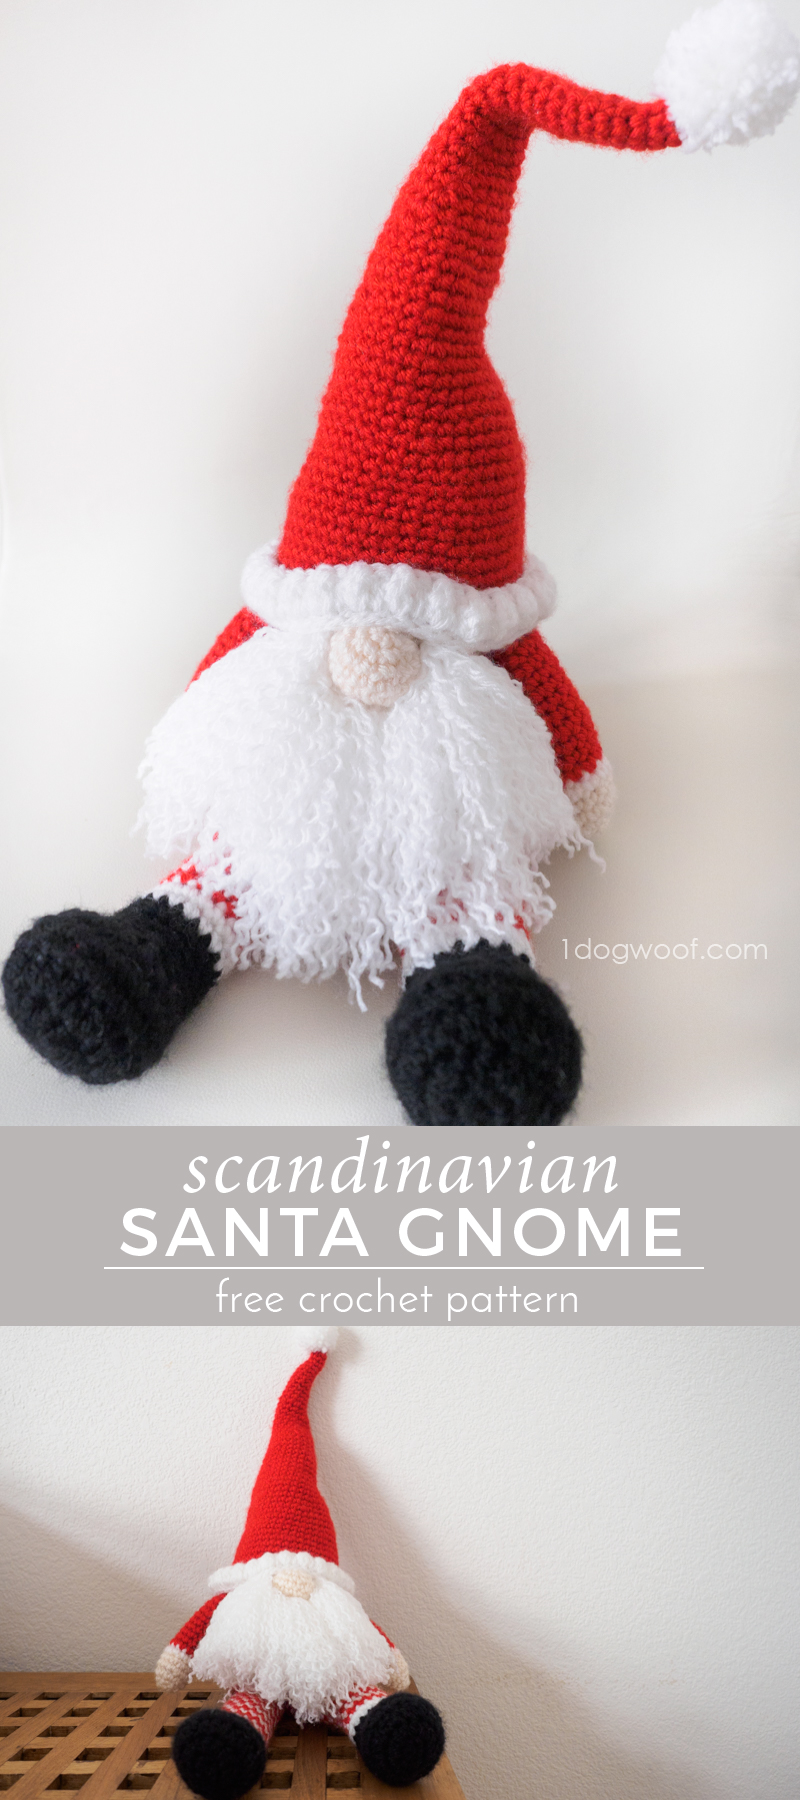 Scandinavian Santa Gnome Amigurumi - One Dog Woof